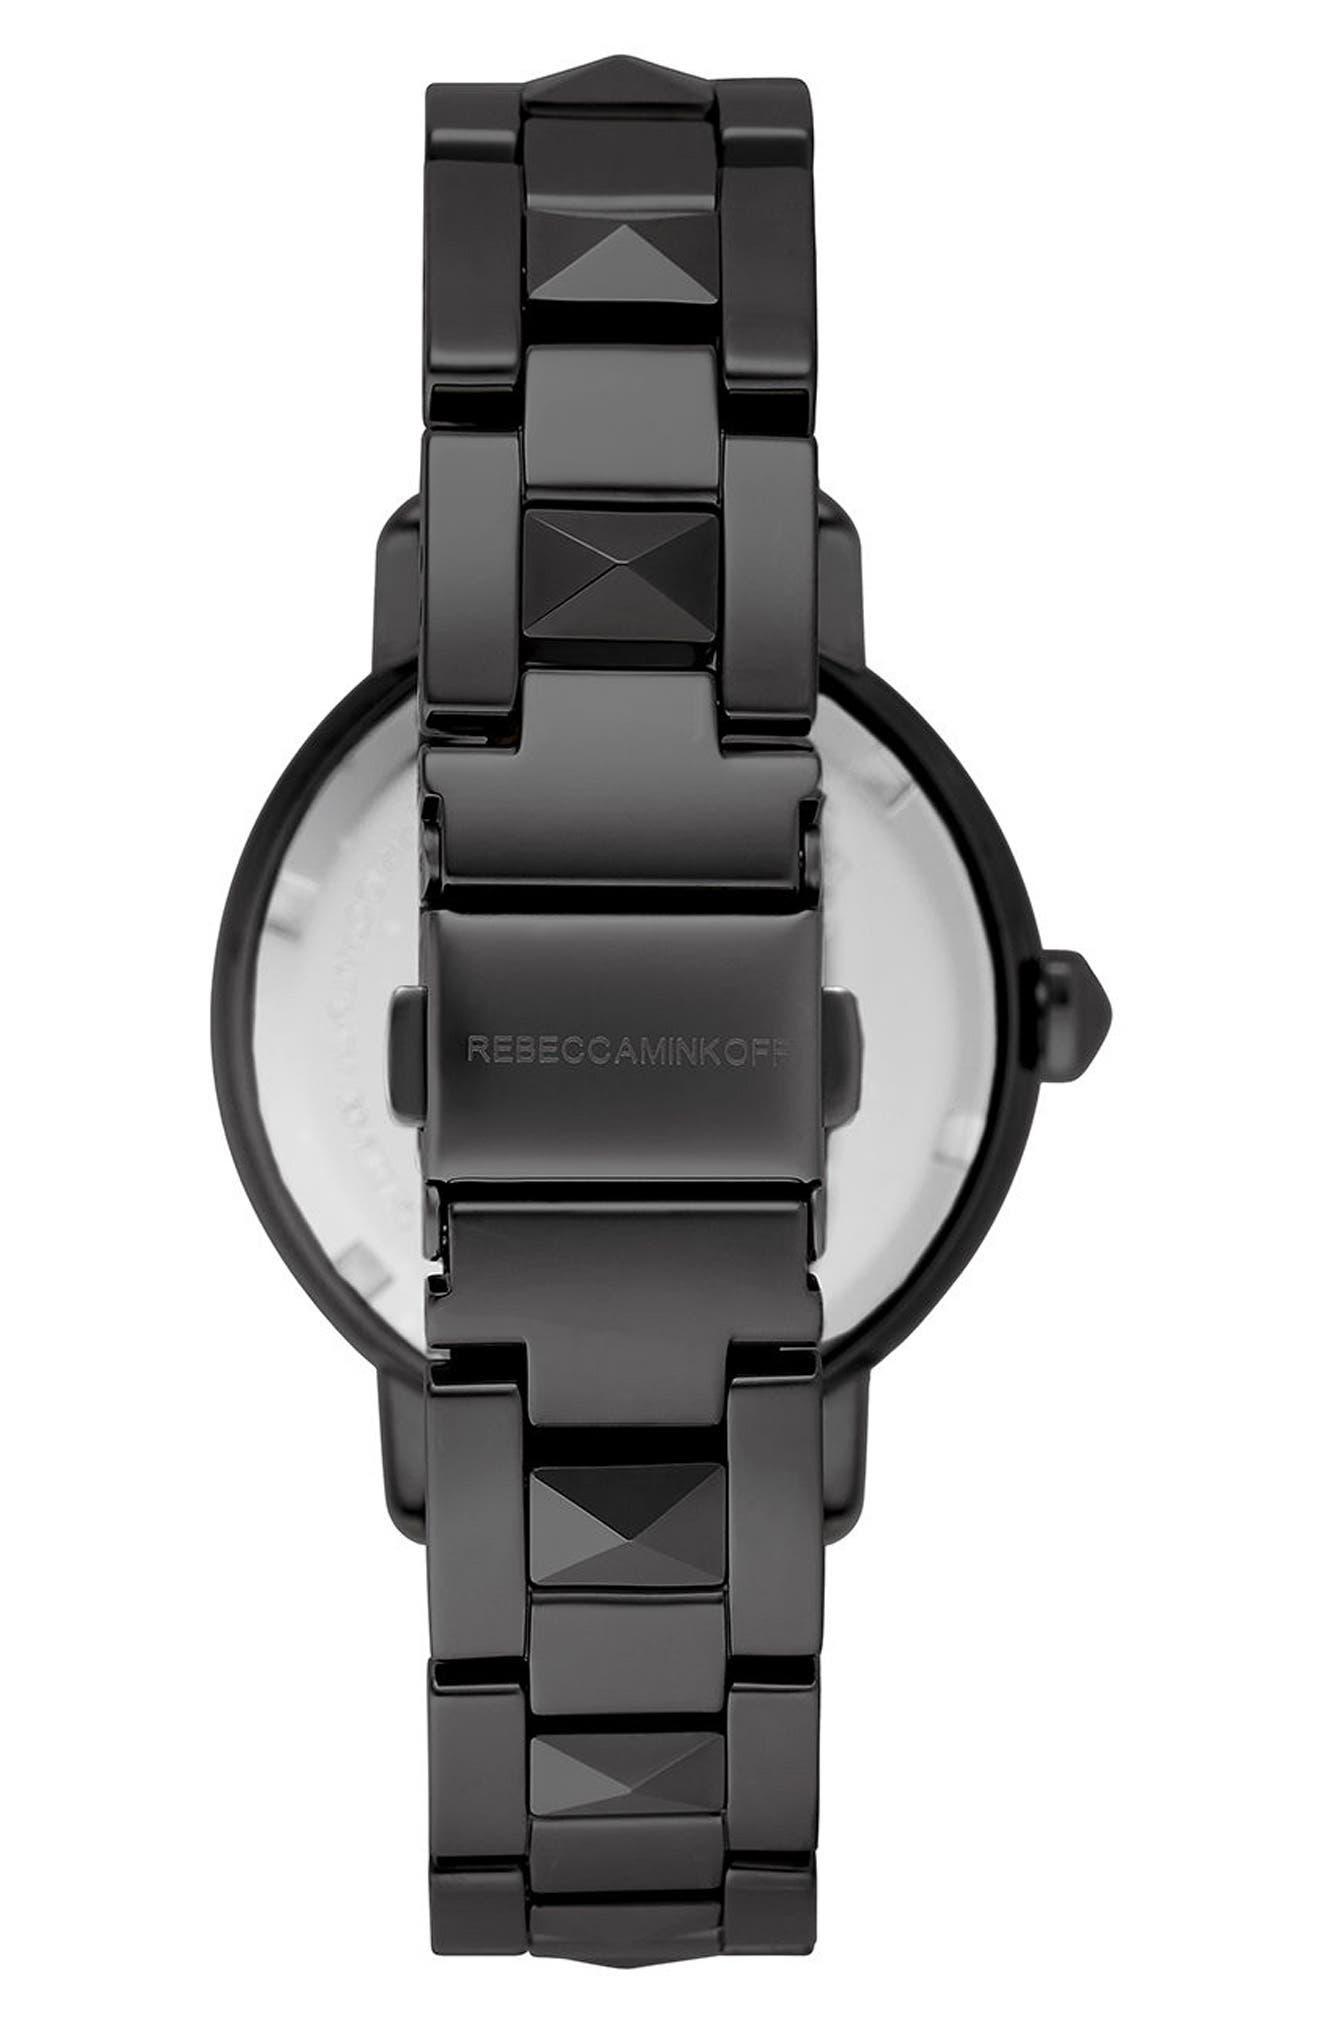 REBECCA MINKOFF,                             BFFL Bracelet Watch, 36mm,                             Alternate thumbnail 2, color,                             001